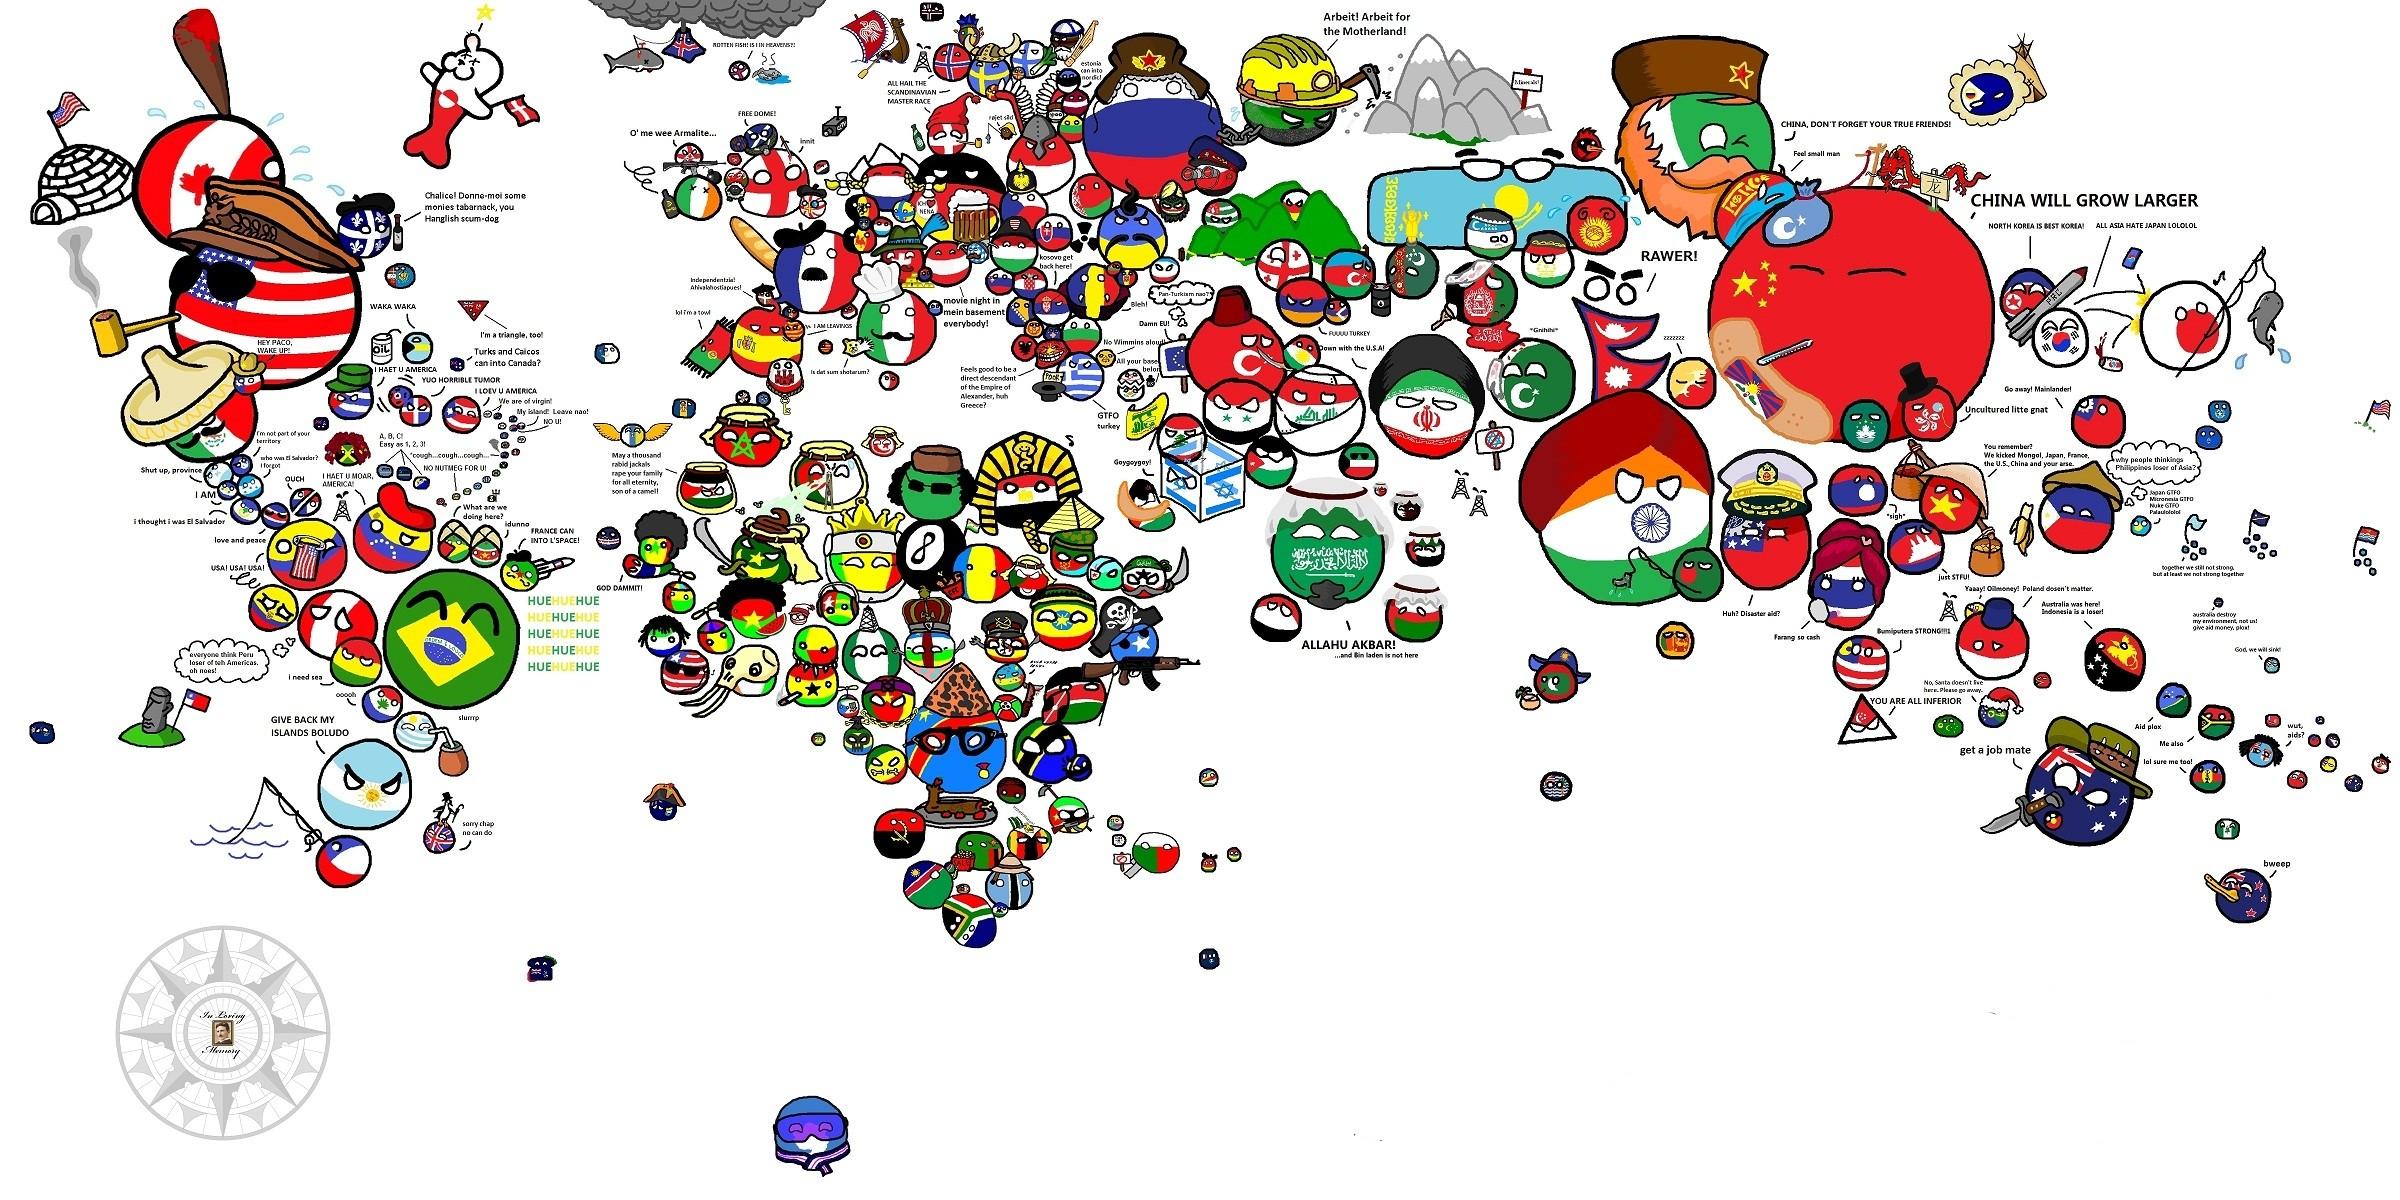 World Funny Wallpaper 2400x1200 World Funny Maps 2400x1200